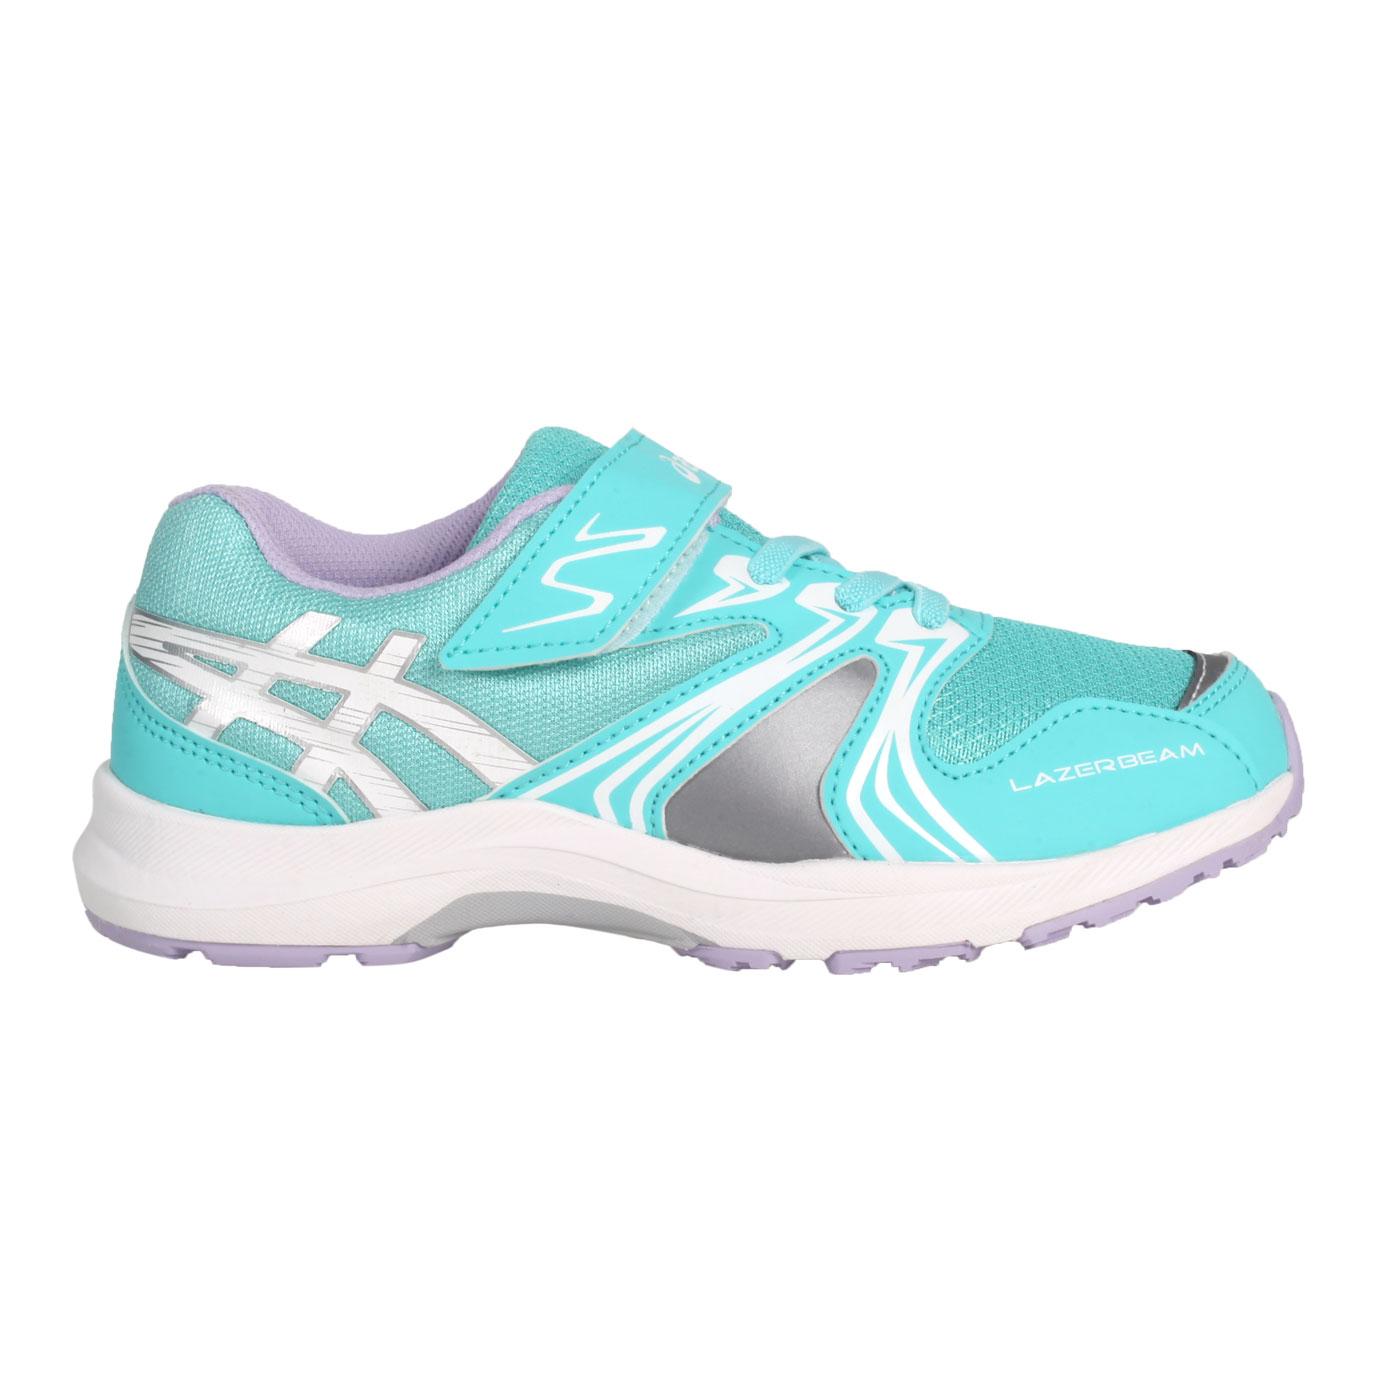 ASICS 中童運動鞋  @LAZERBEAM KA-MG@1154A109-404 - 湖水綠白紫